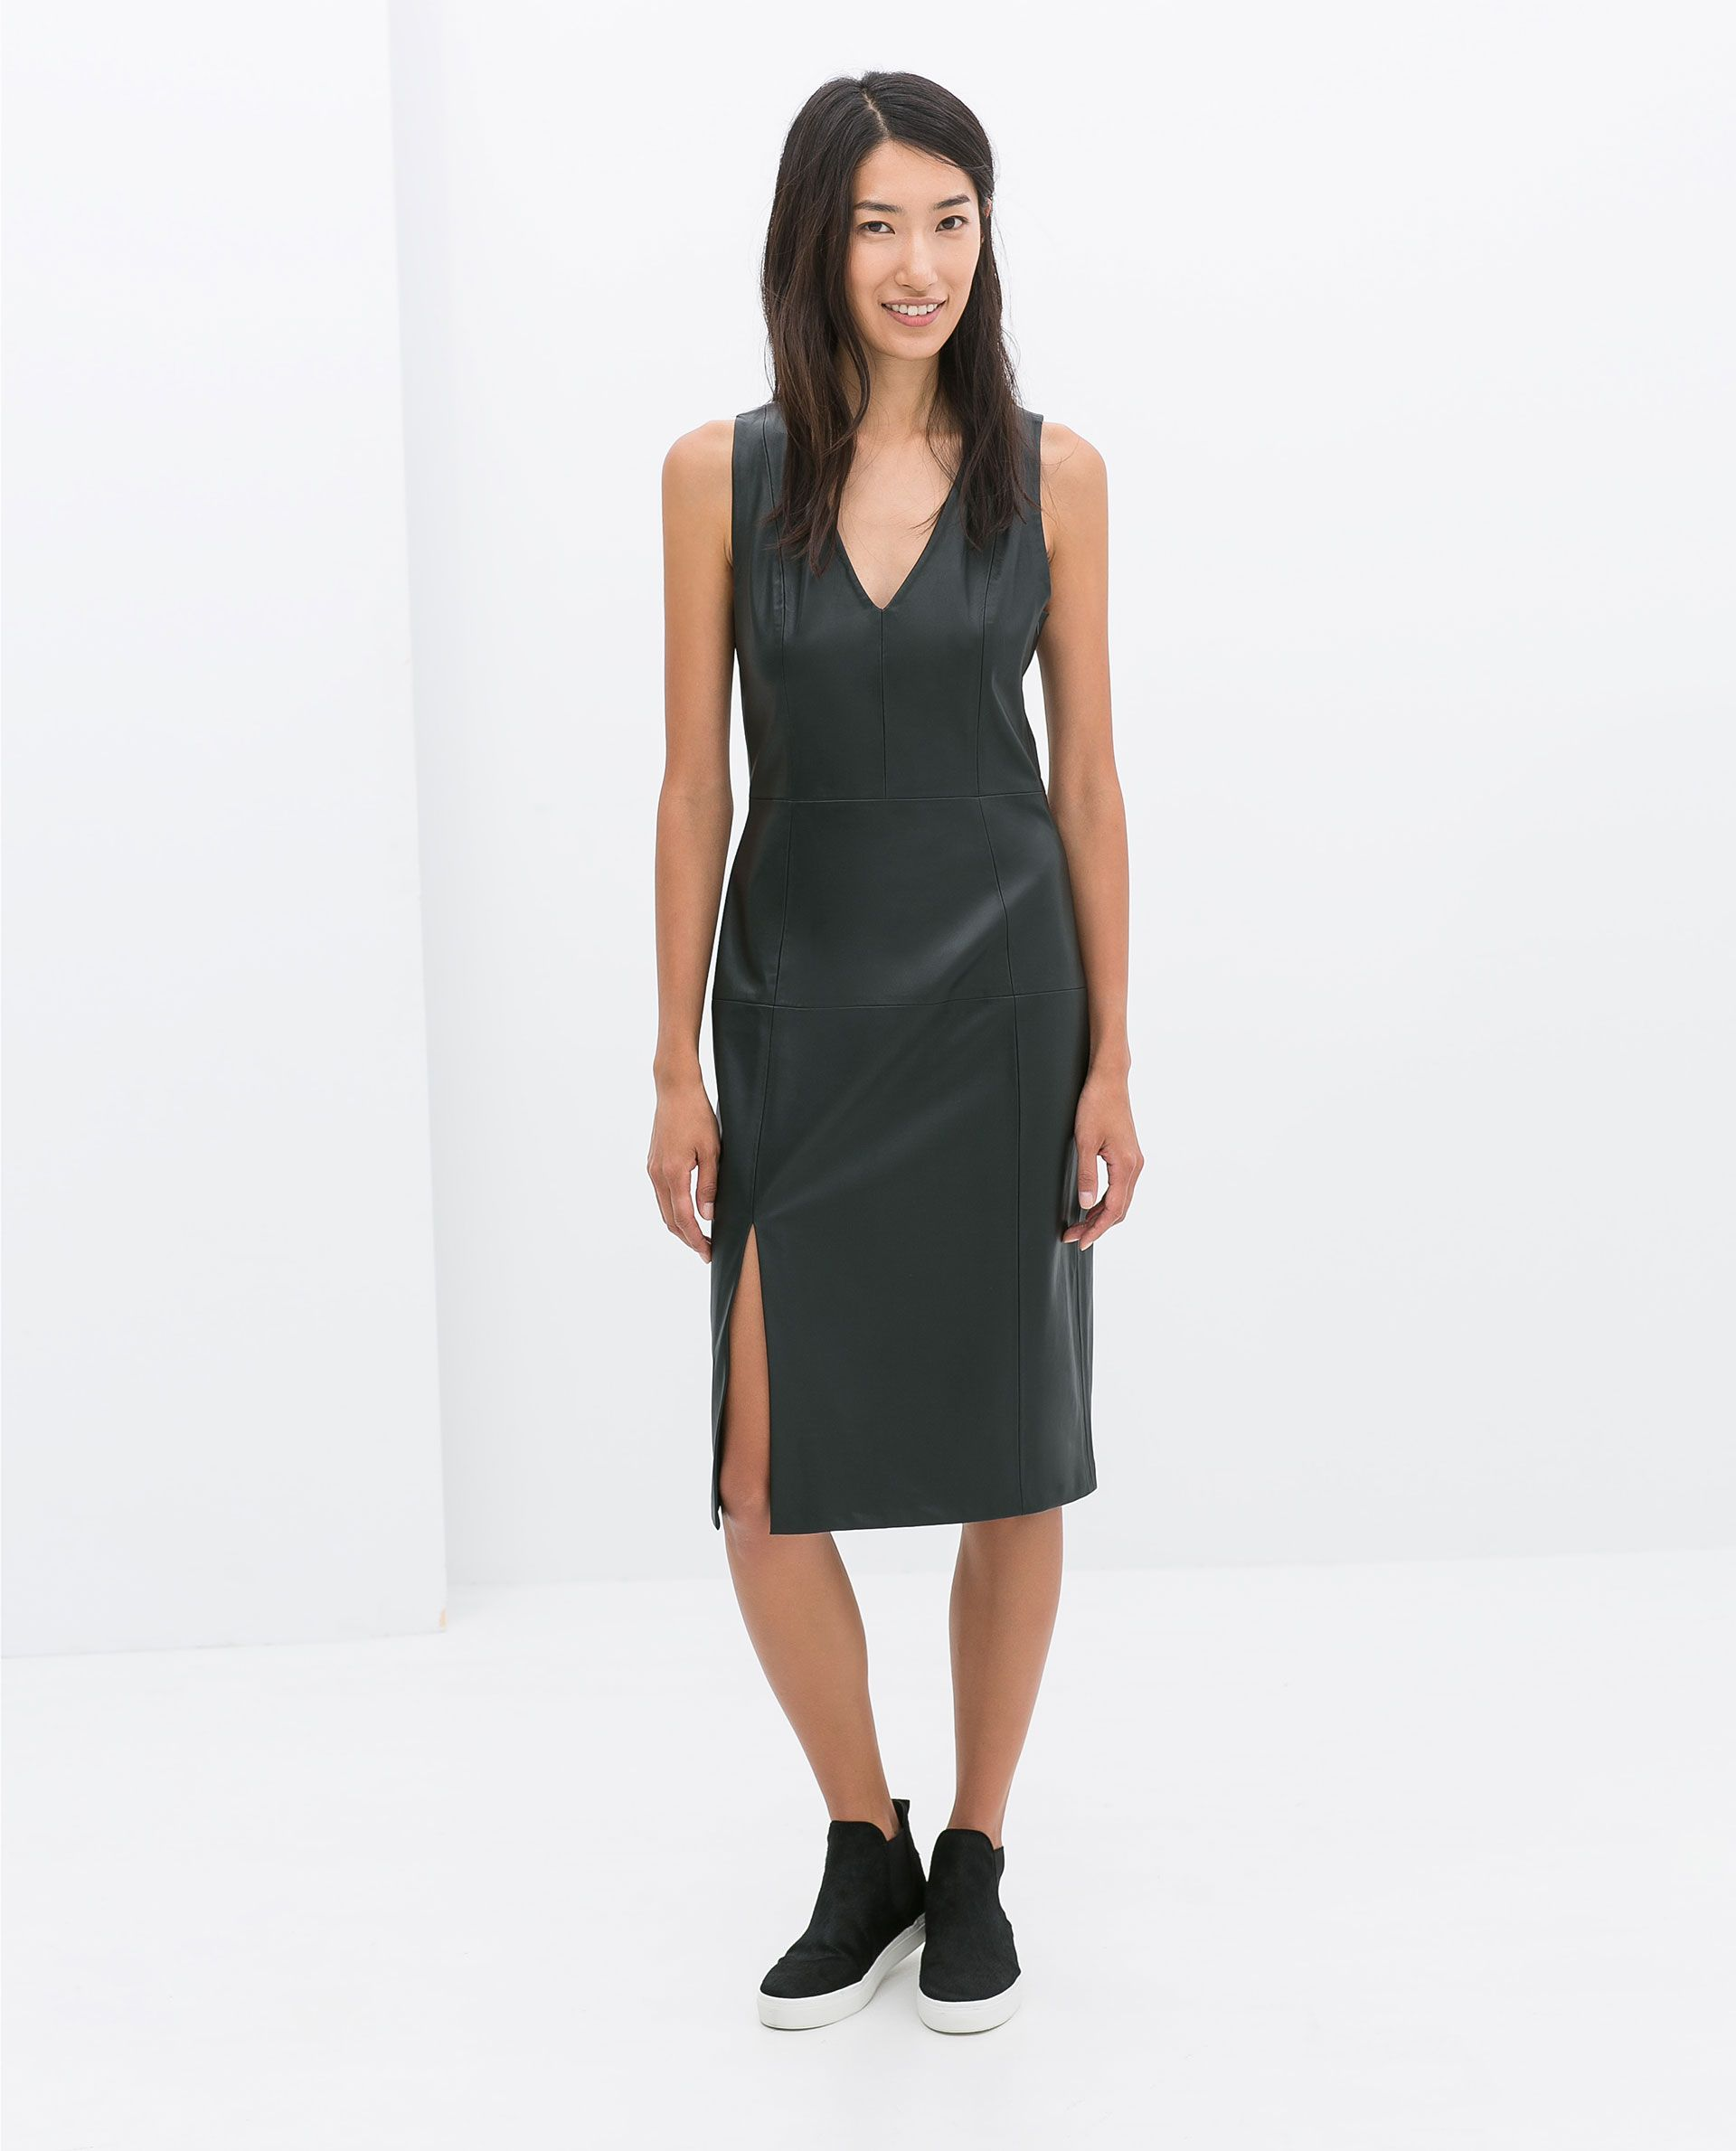 Zara Green Faux Leather Dress Lyst Faux leather